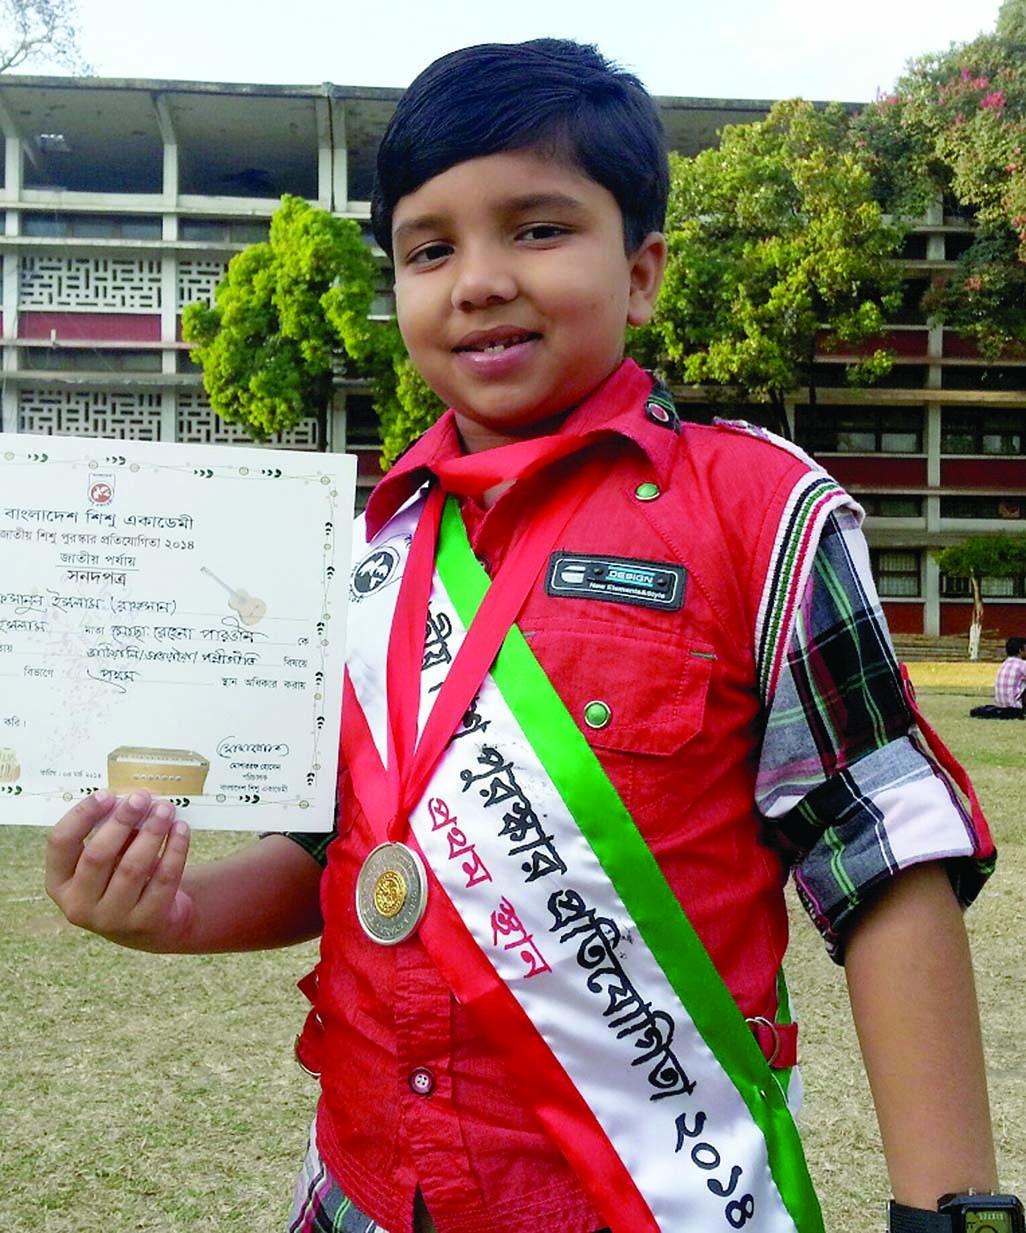 Nat'l Child Award 2014 Rafsan best in Bhatiali, Bhawaiya, folk songs